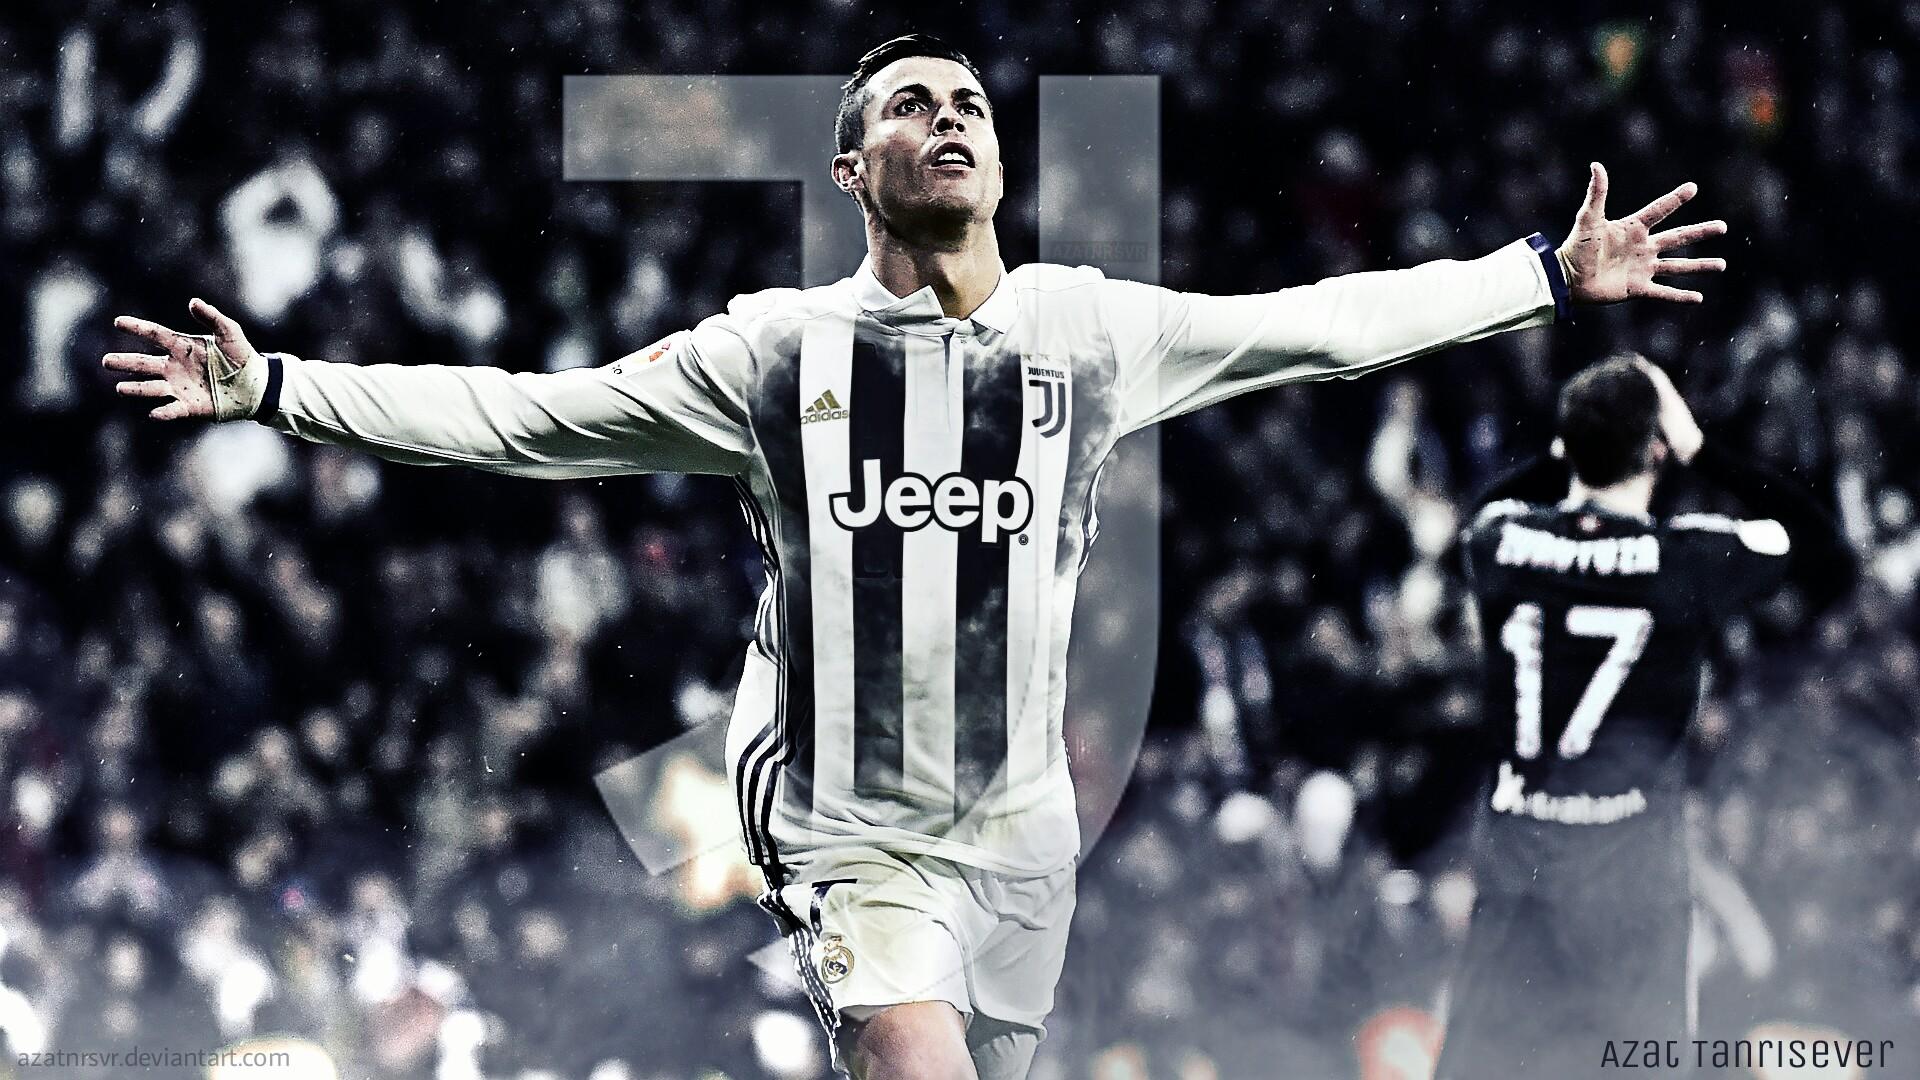 Ronaldo Juventus Wallpapers: Cristiano Ronaldo Juventus- Wallpaper By Azatnrsvr On